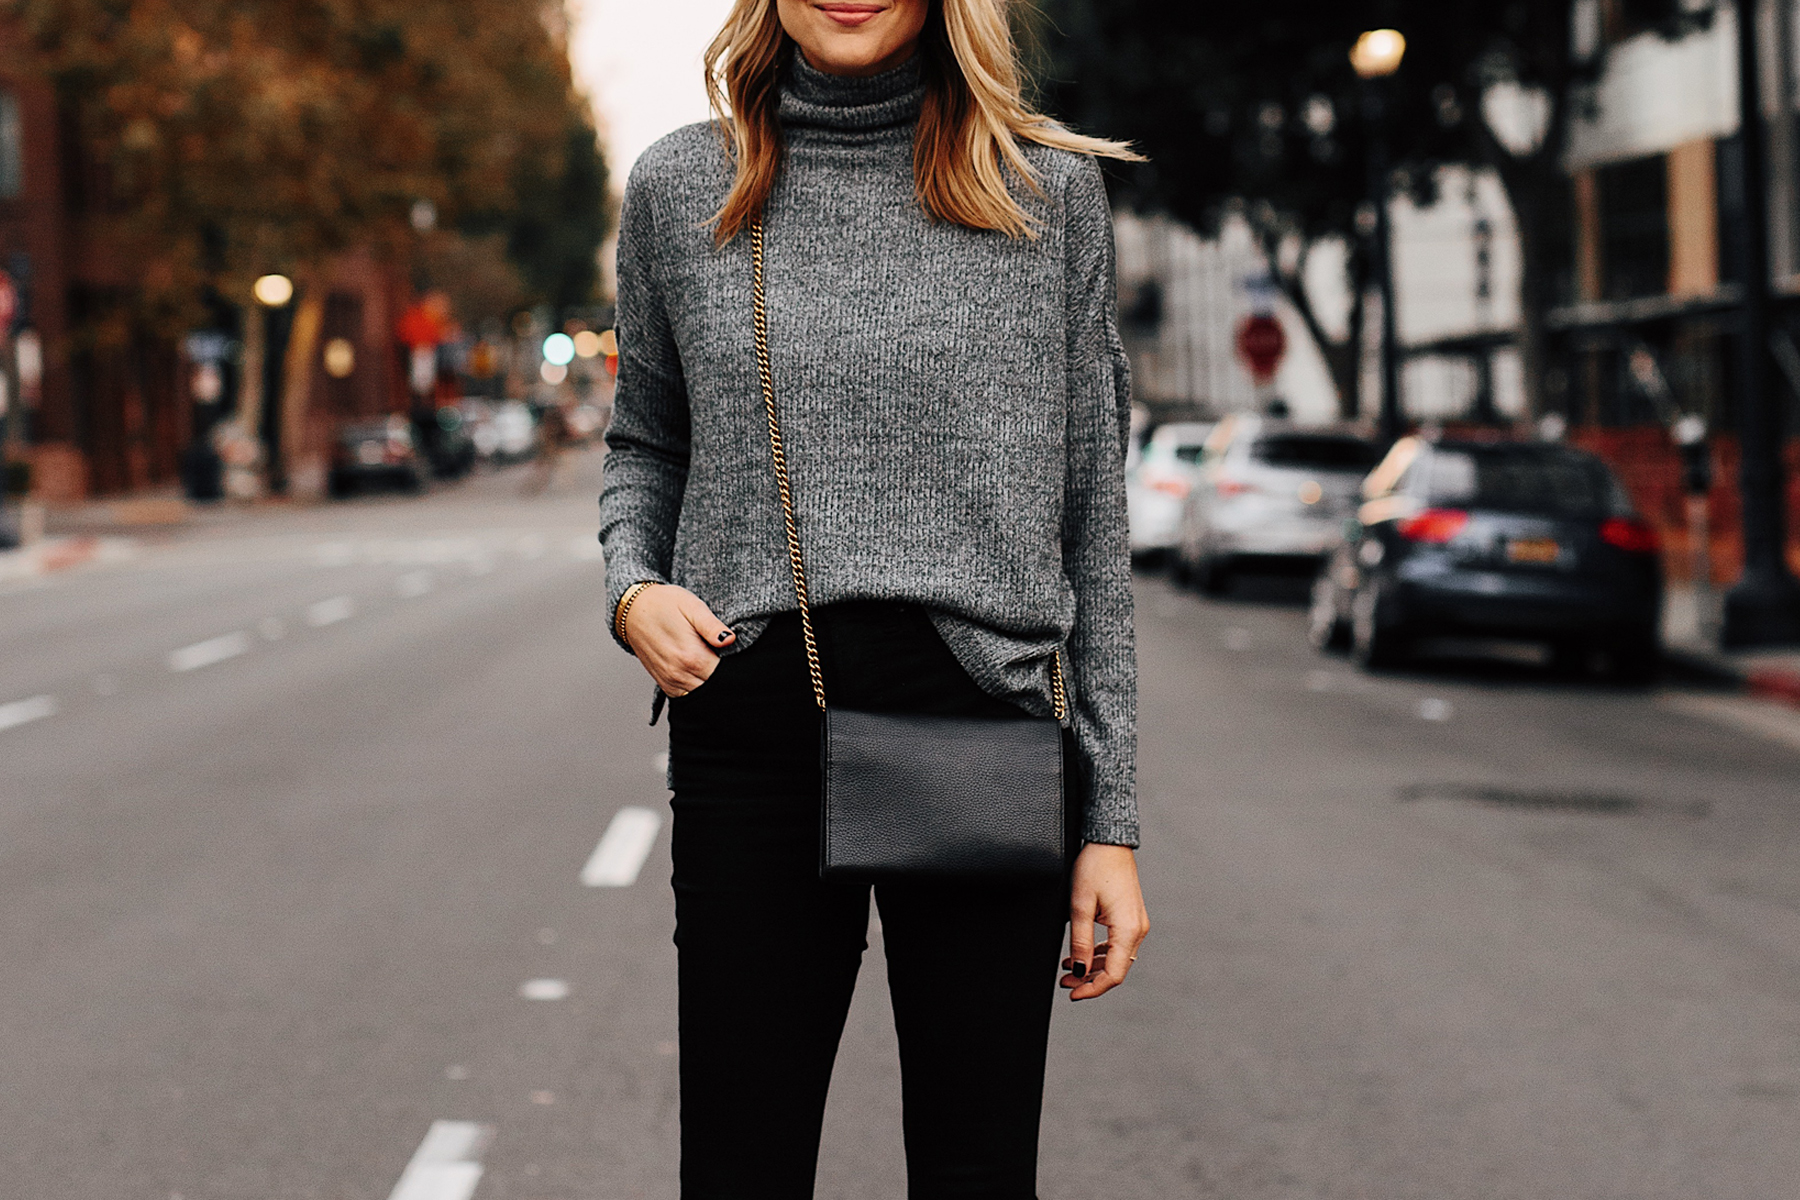 Blonde Woman Wearing Heather Grey Turtleneck Black Skinny Jeans Outfit Black Crossbody Handbag Fashion Jackson San Diego Fashion Blogger Street Style